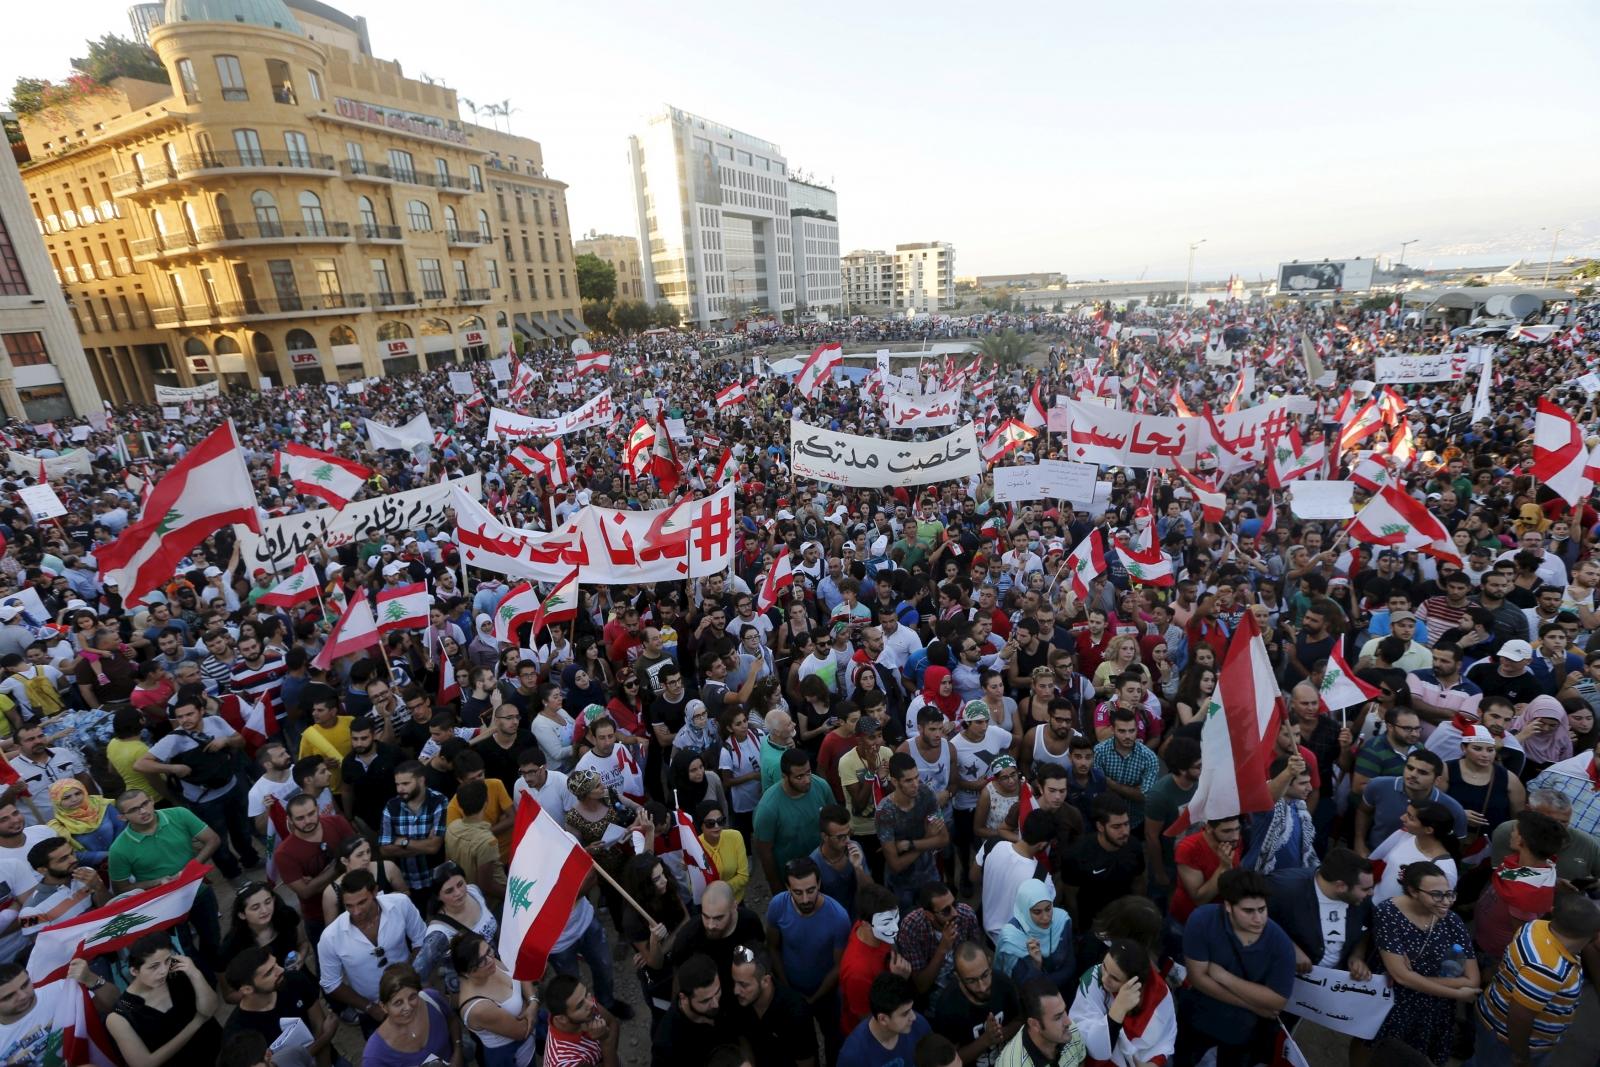 Lebanon You Stink protests